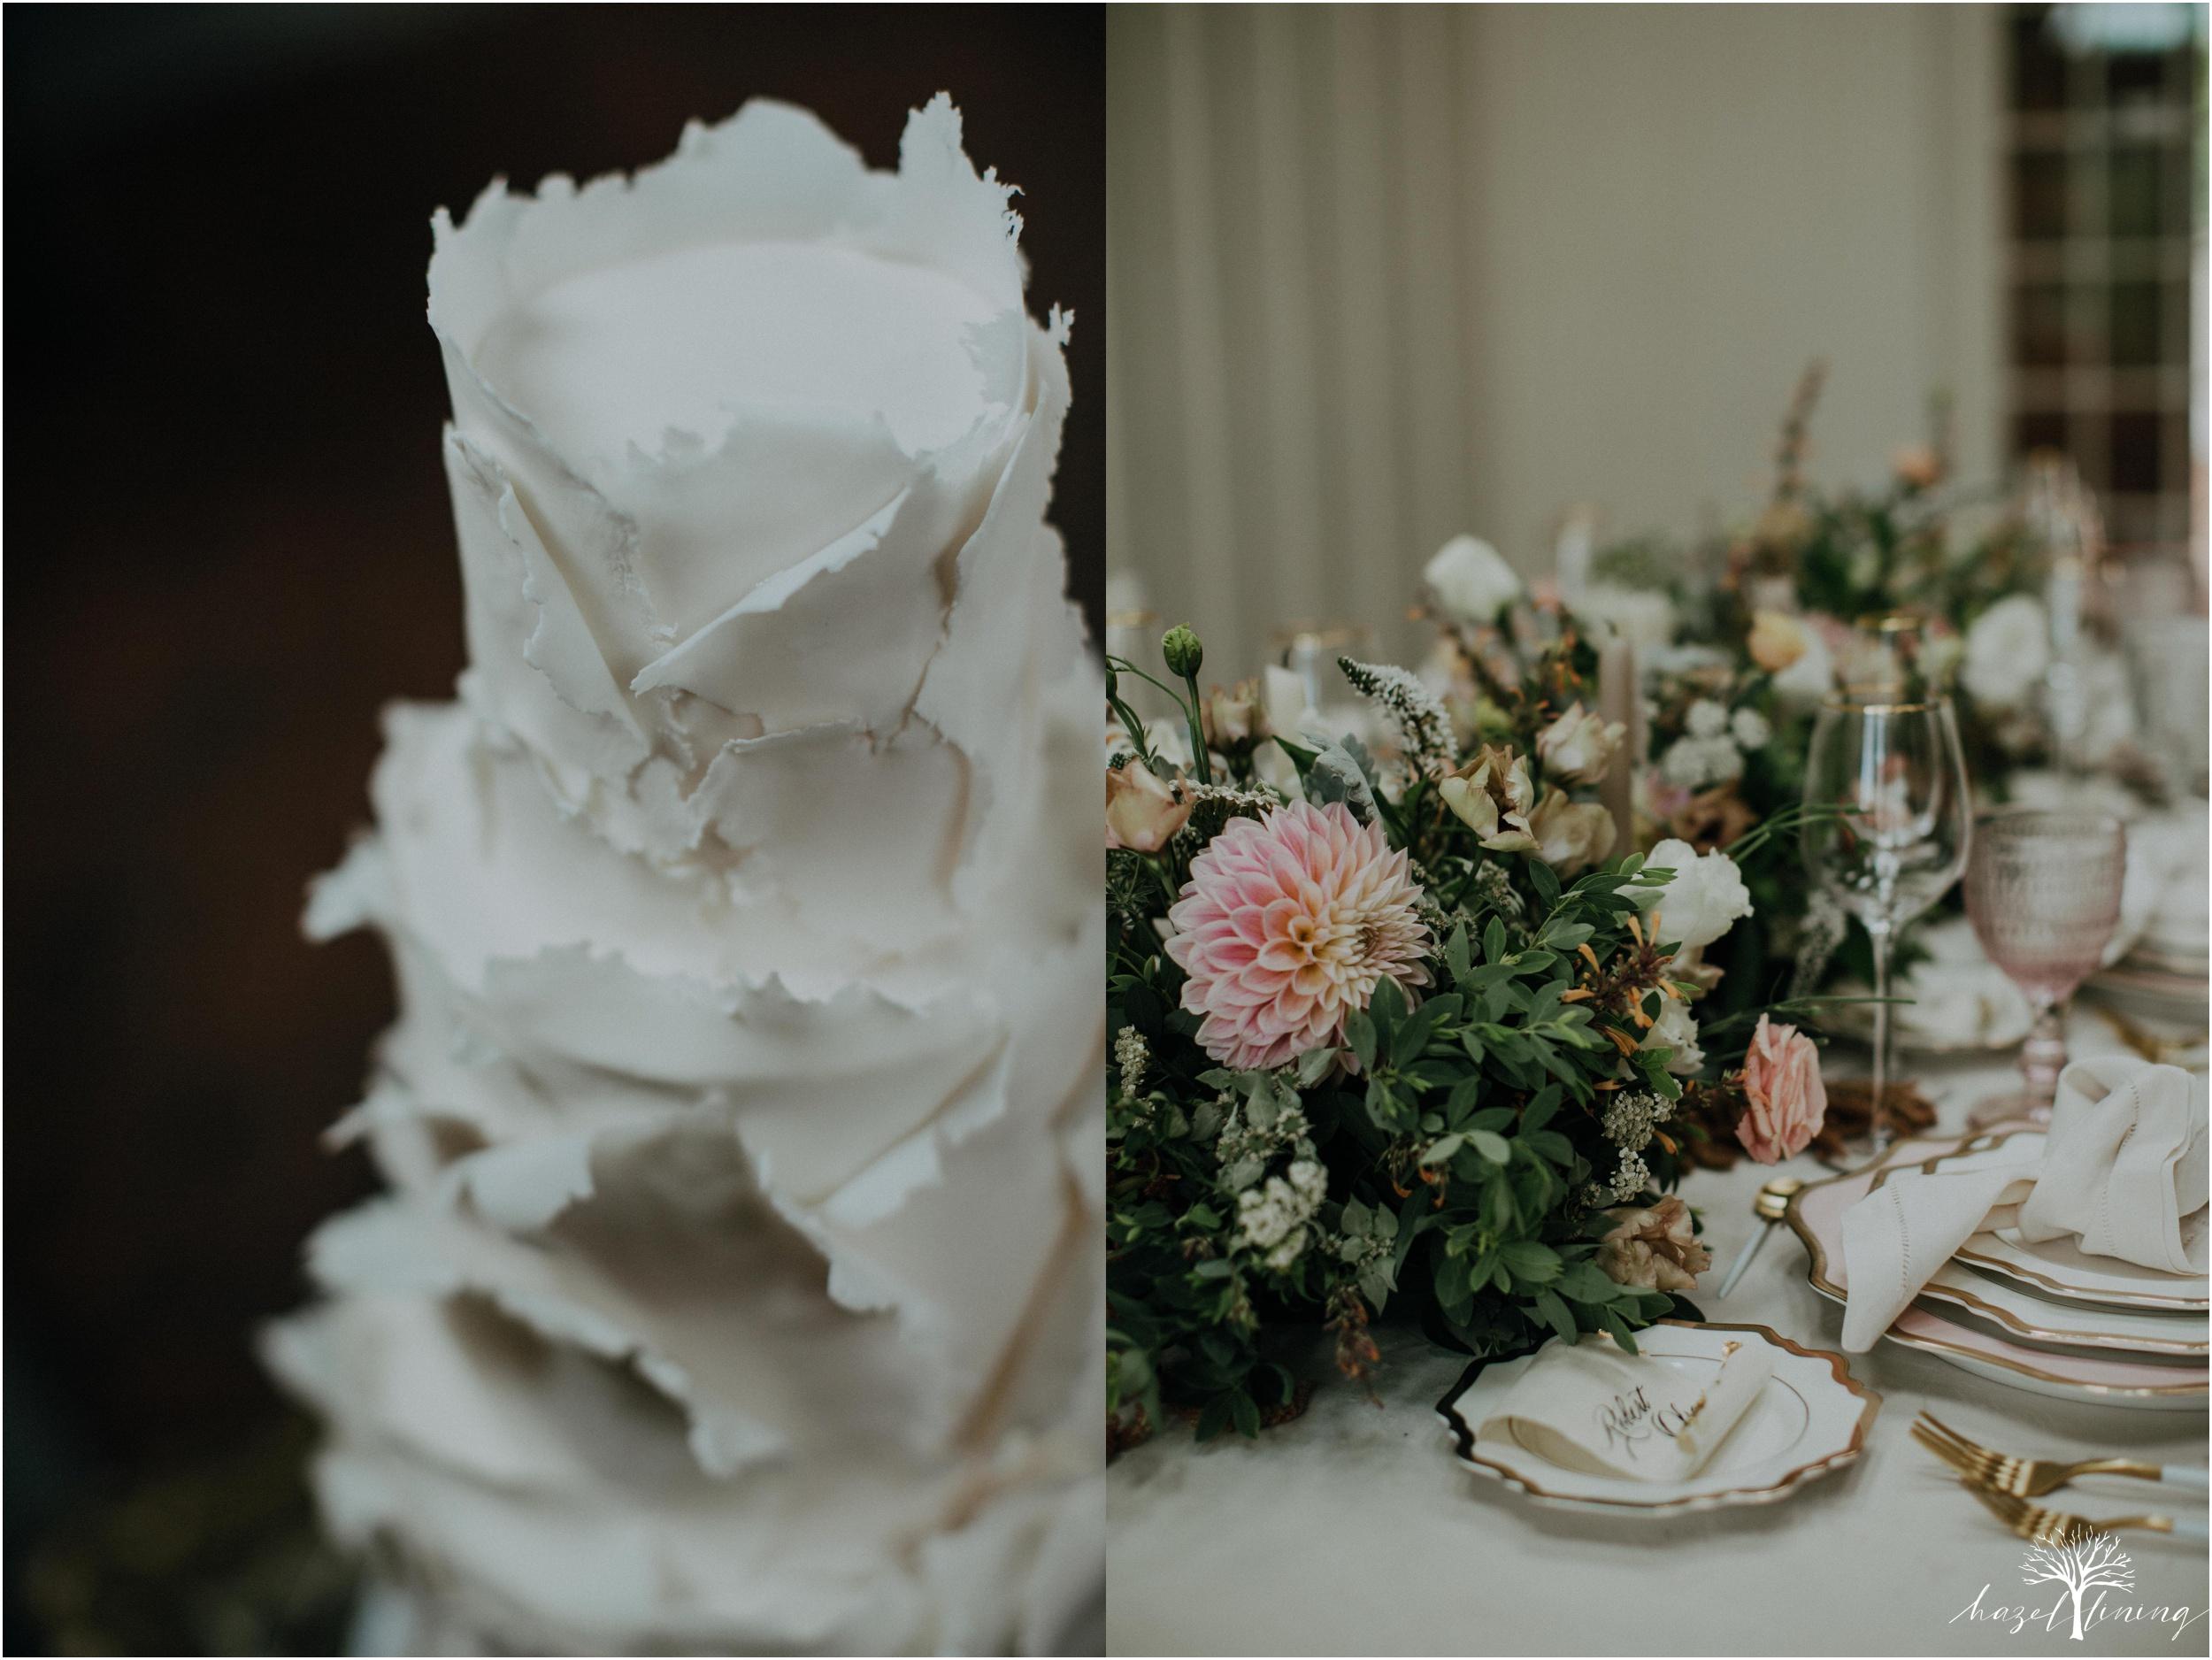 carl-chloe-the-ryland-inn-whitehouse-station-new-jersey-styled-squad-hazel-lining-photography-destination-elopement-wedding-engagement-photography_0009.jpg